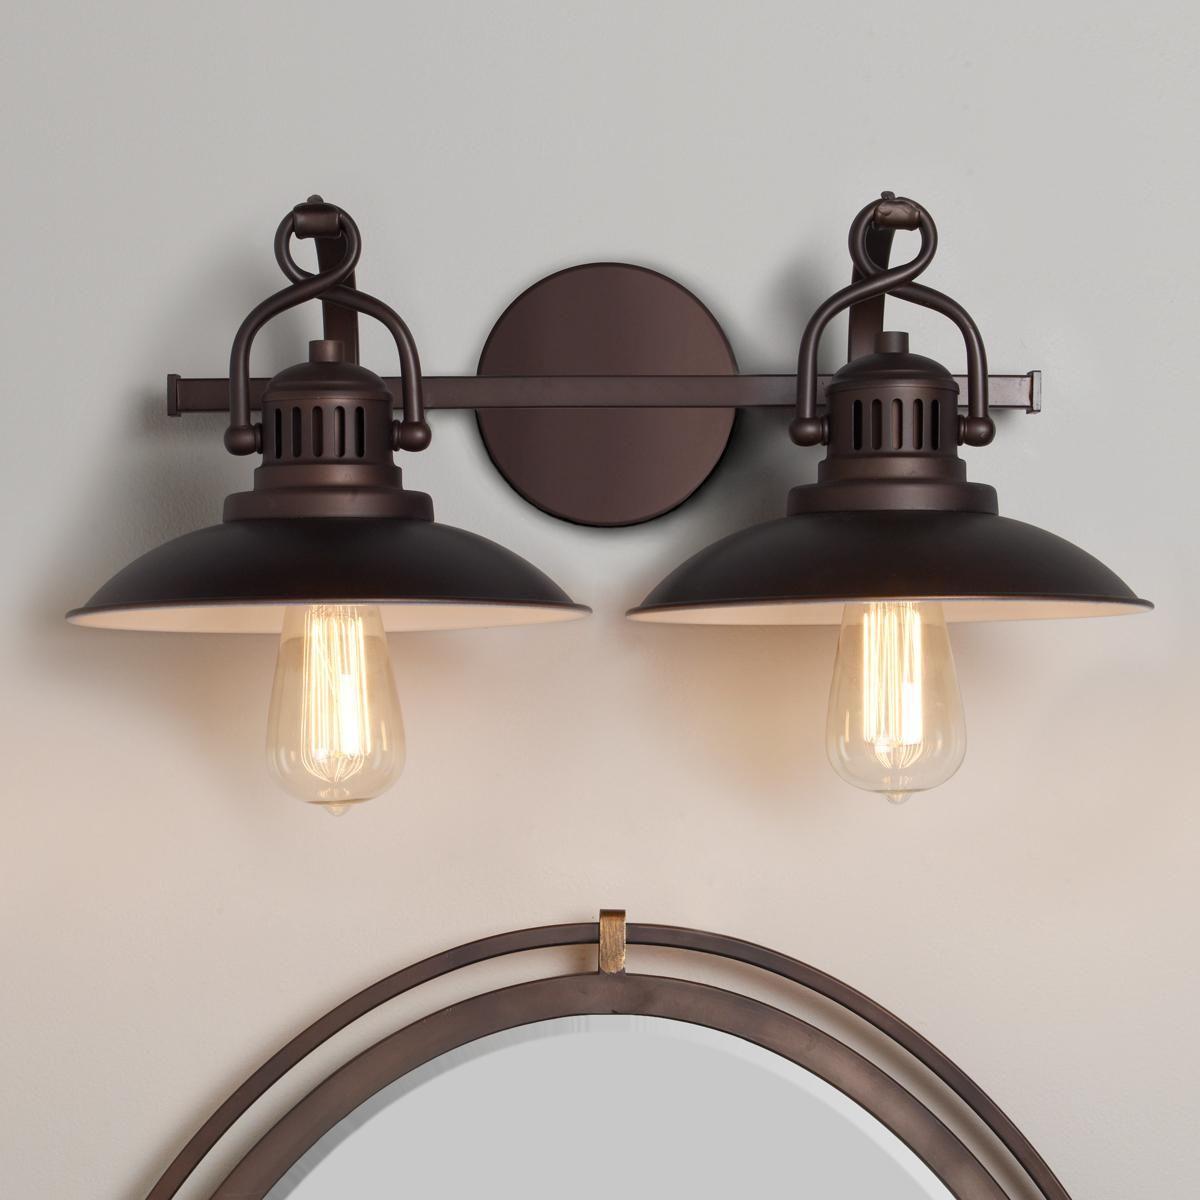 Station Lantern Bath Light 2 Light Bath Light